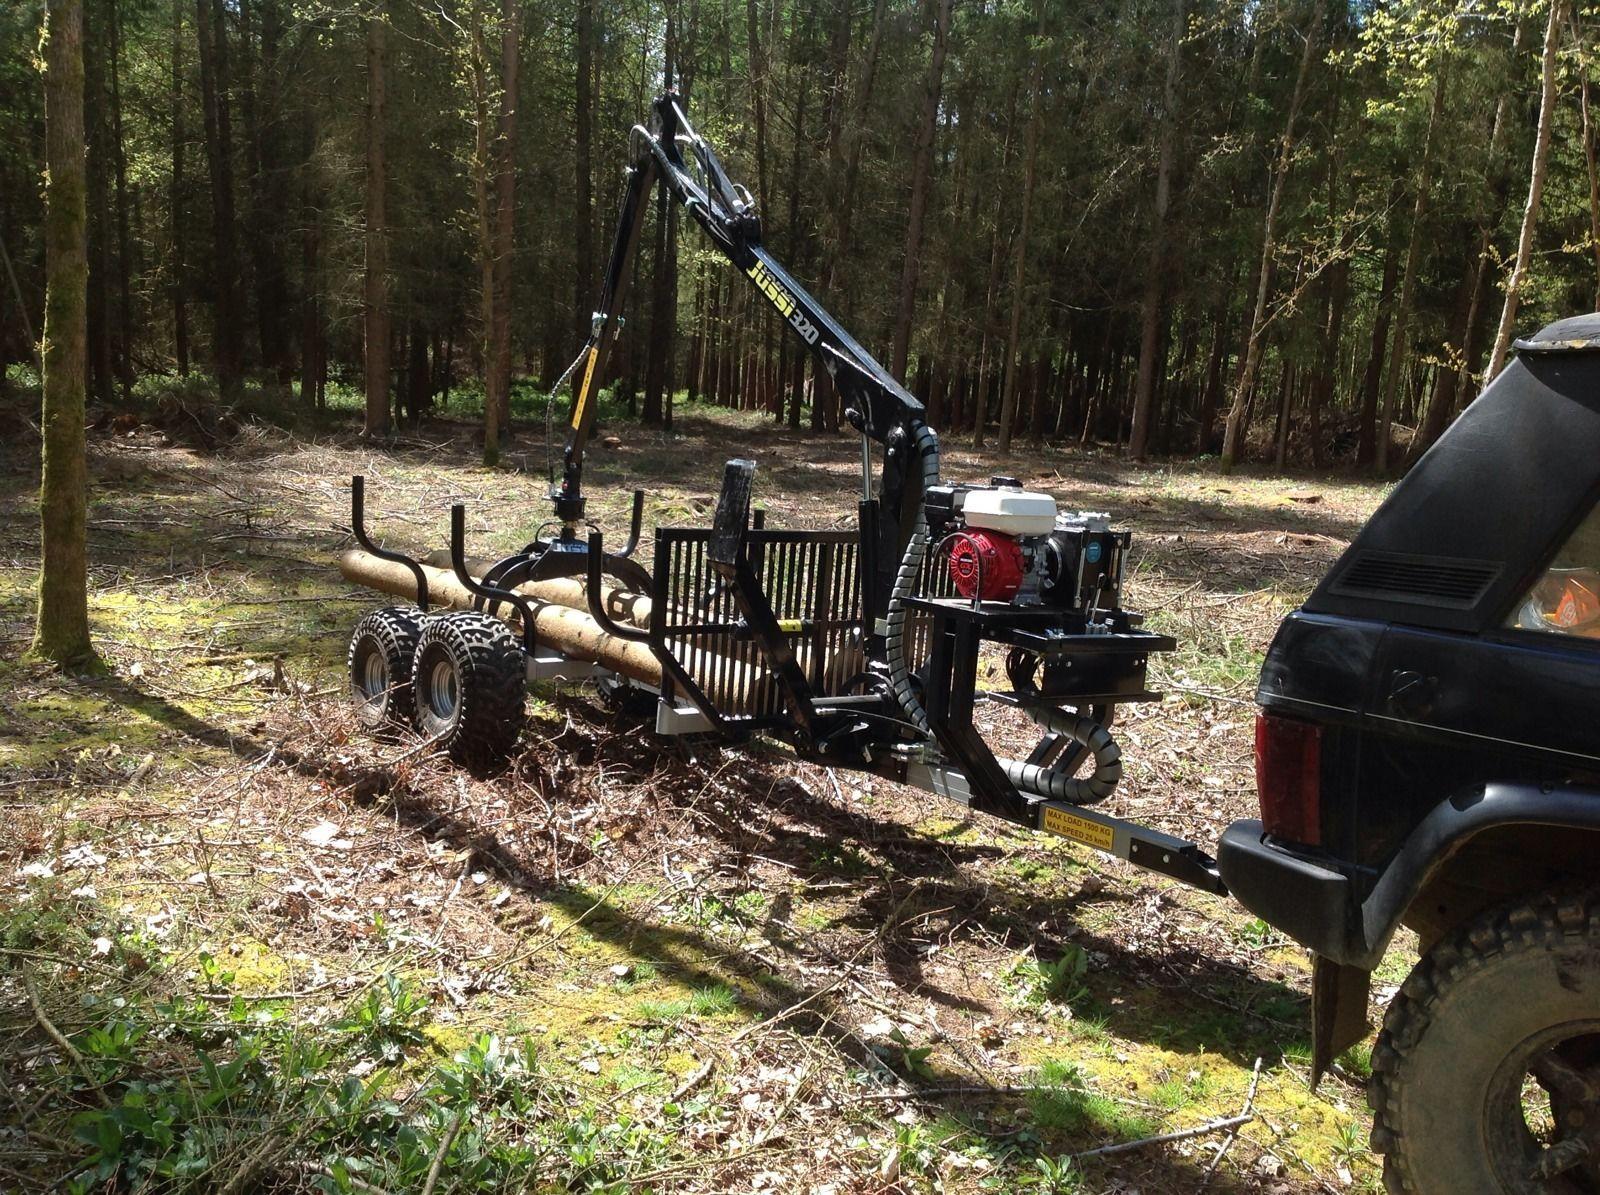 Land rover range rover hilux 2 tonne forestry timber crane trailer honda engine ebay